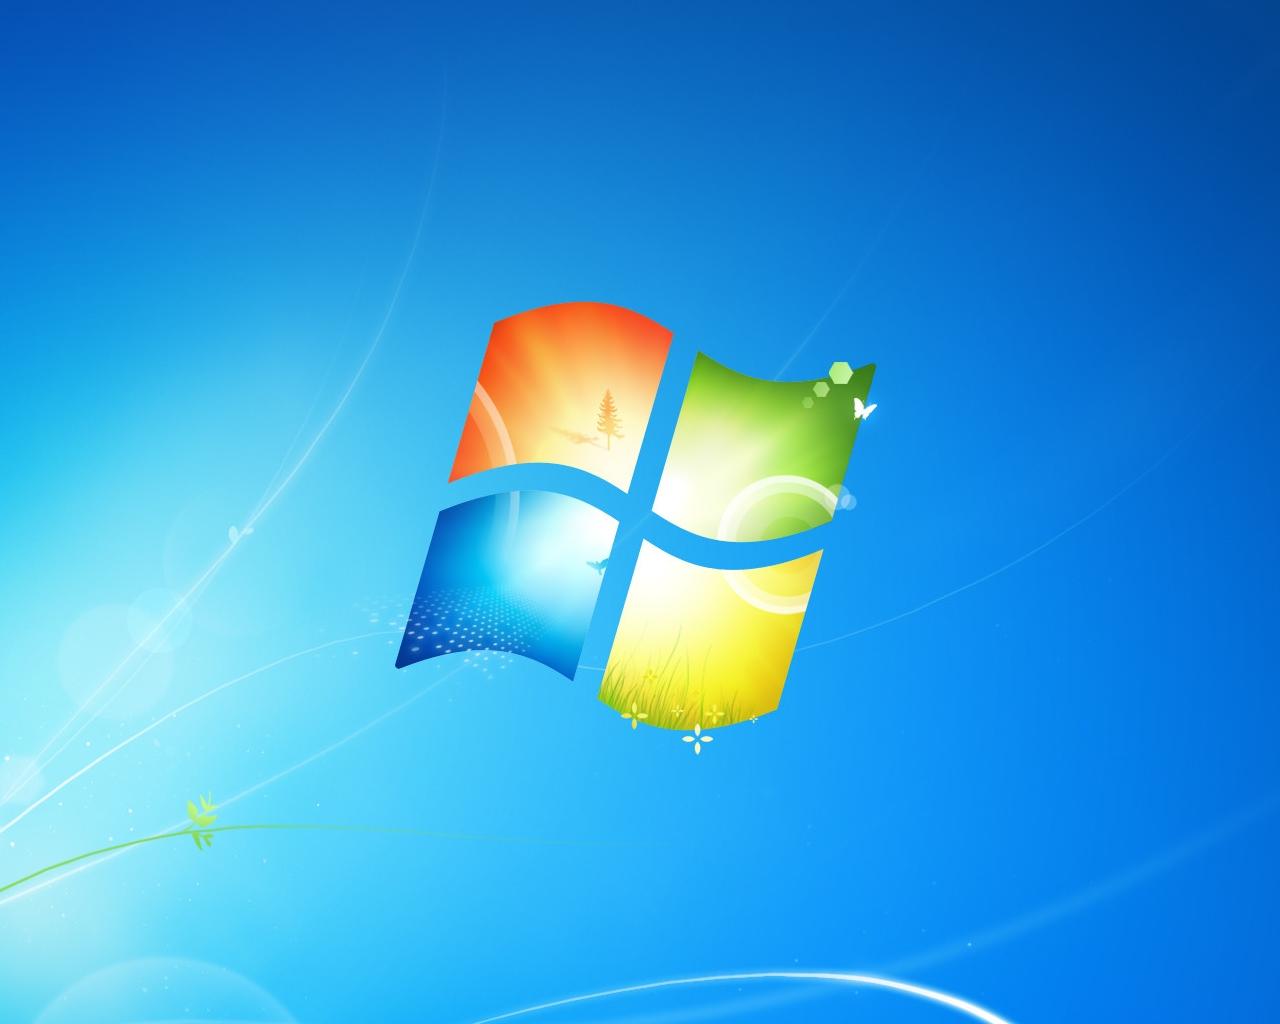 http://2.bp.blogspot.com/_WFPjKGKQauU/TQj6eHsaCOI/AAAAAAAAAAw/DhHms4LEJE0/s1600/Windows_7_Official_Wallpaper_1280x1024.jpg